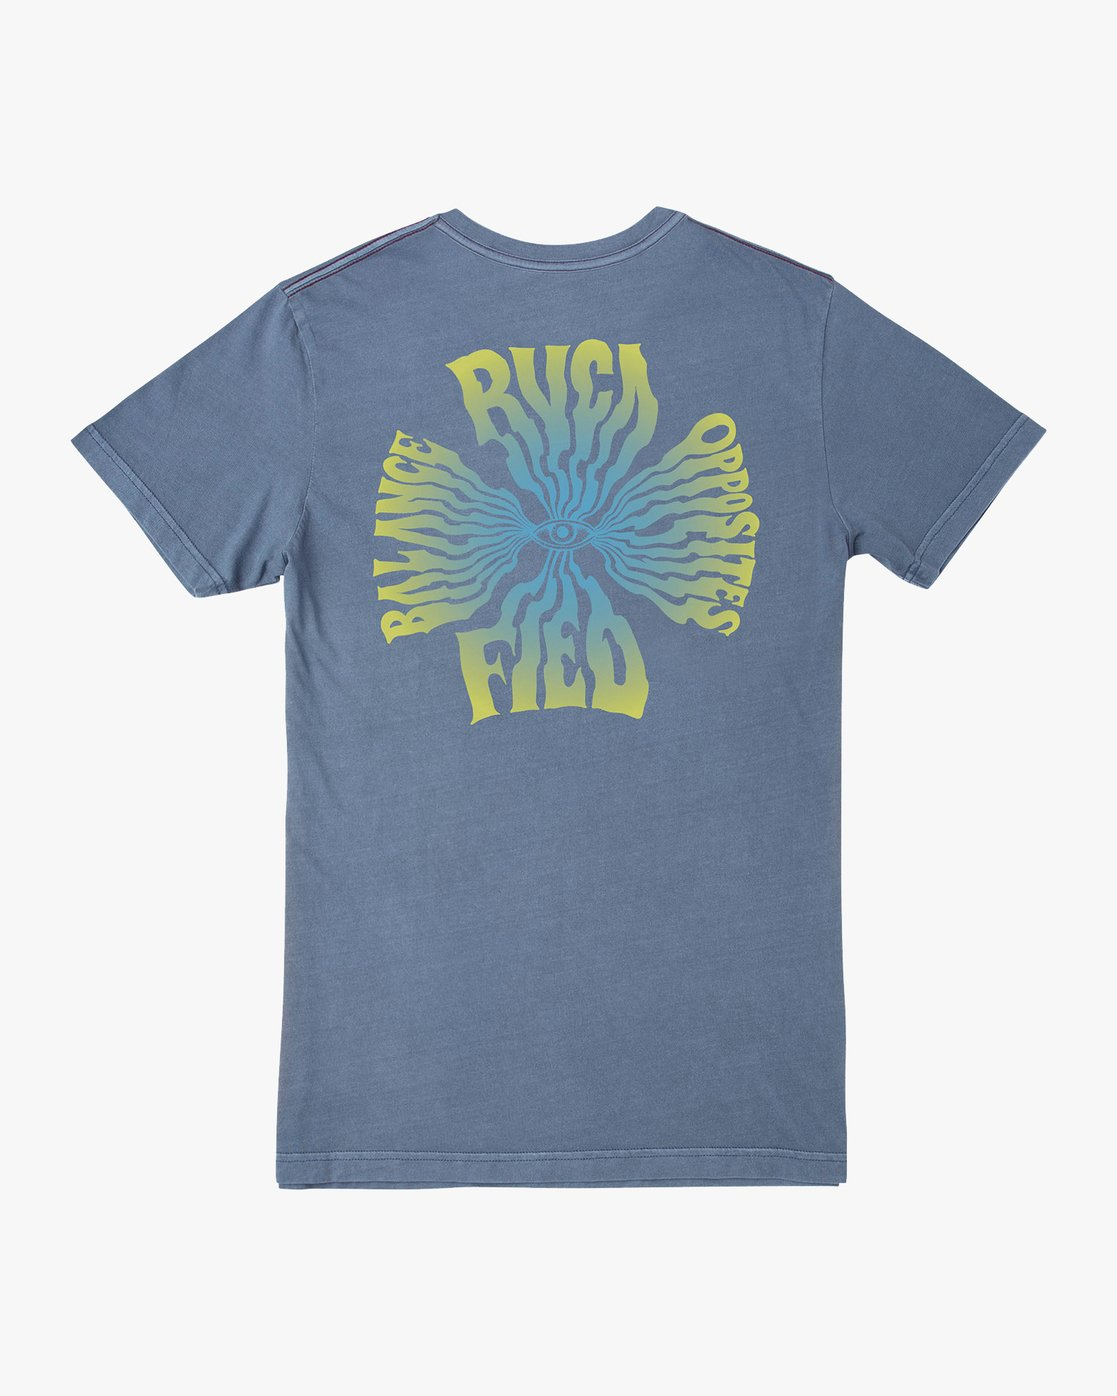 0 DMOTE Rvcafied T-Shirt Blue M438URRV RVCA